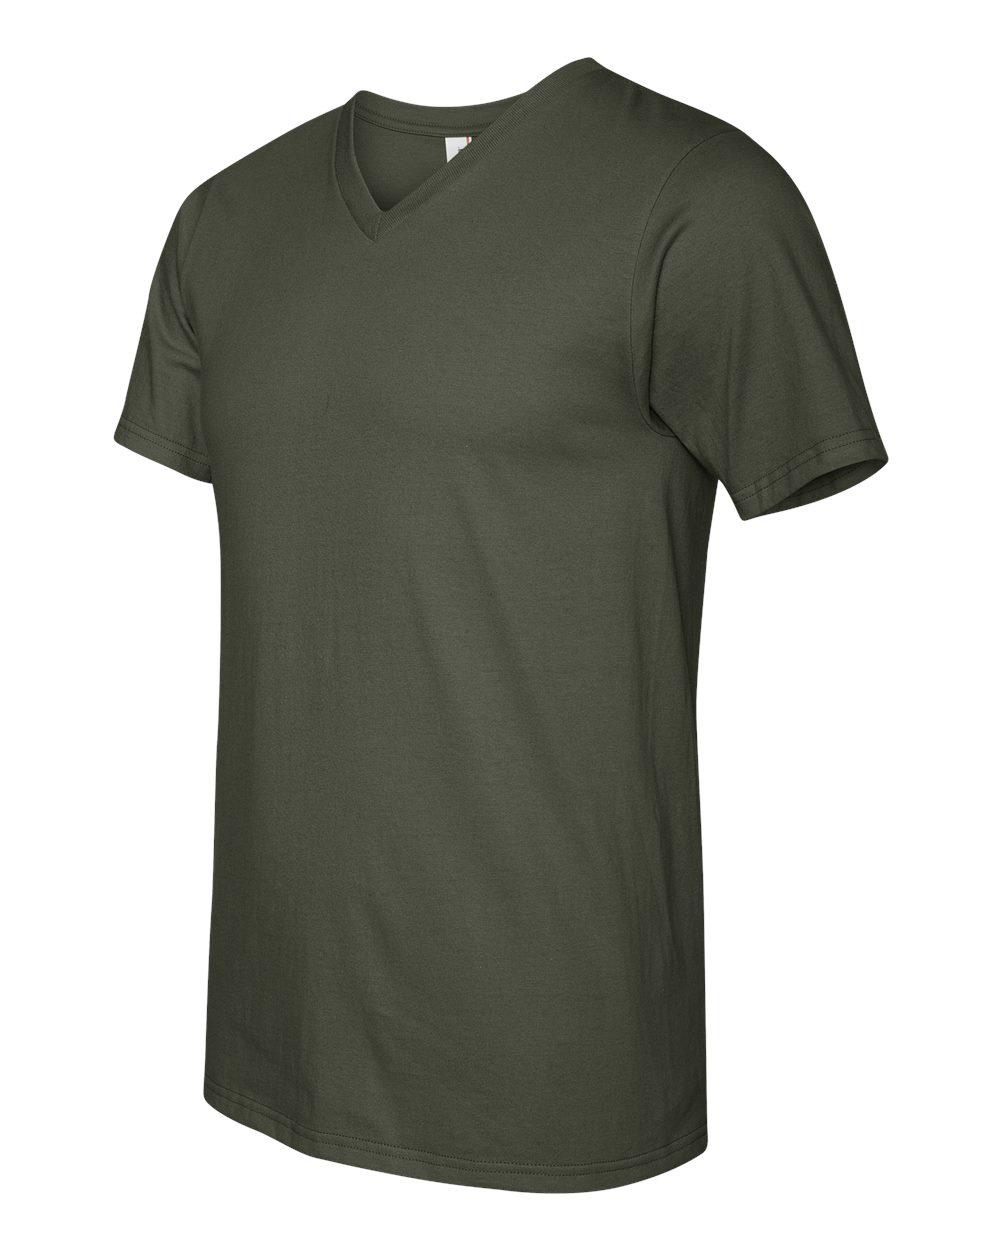 Anvil-Men-039-s-Lightweight-V-Neck-T-Shirt-982-S-3XL thumbnail 9